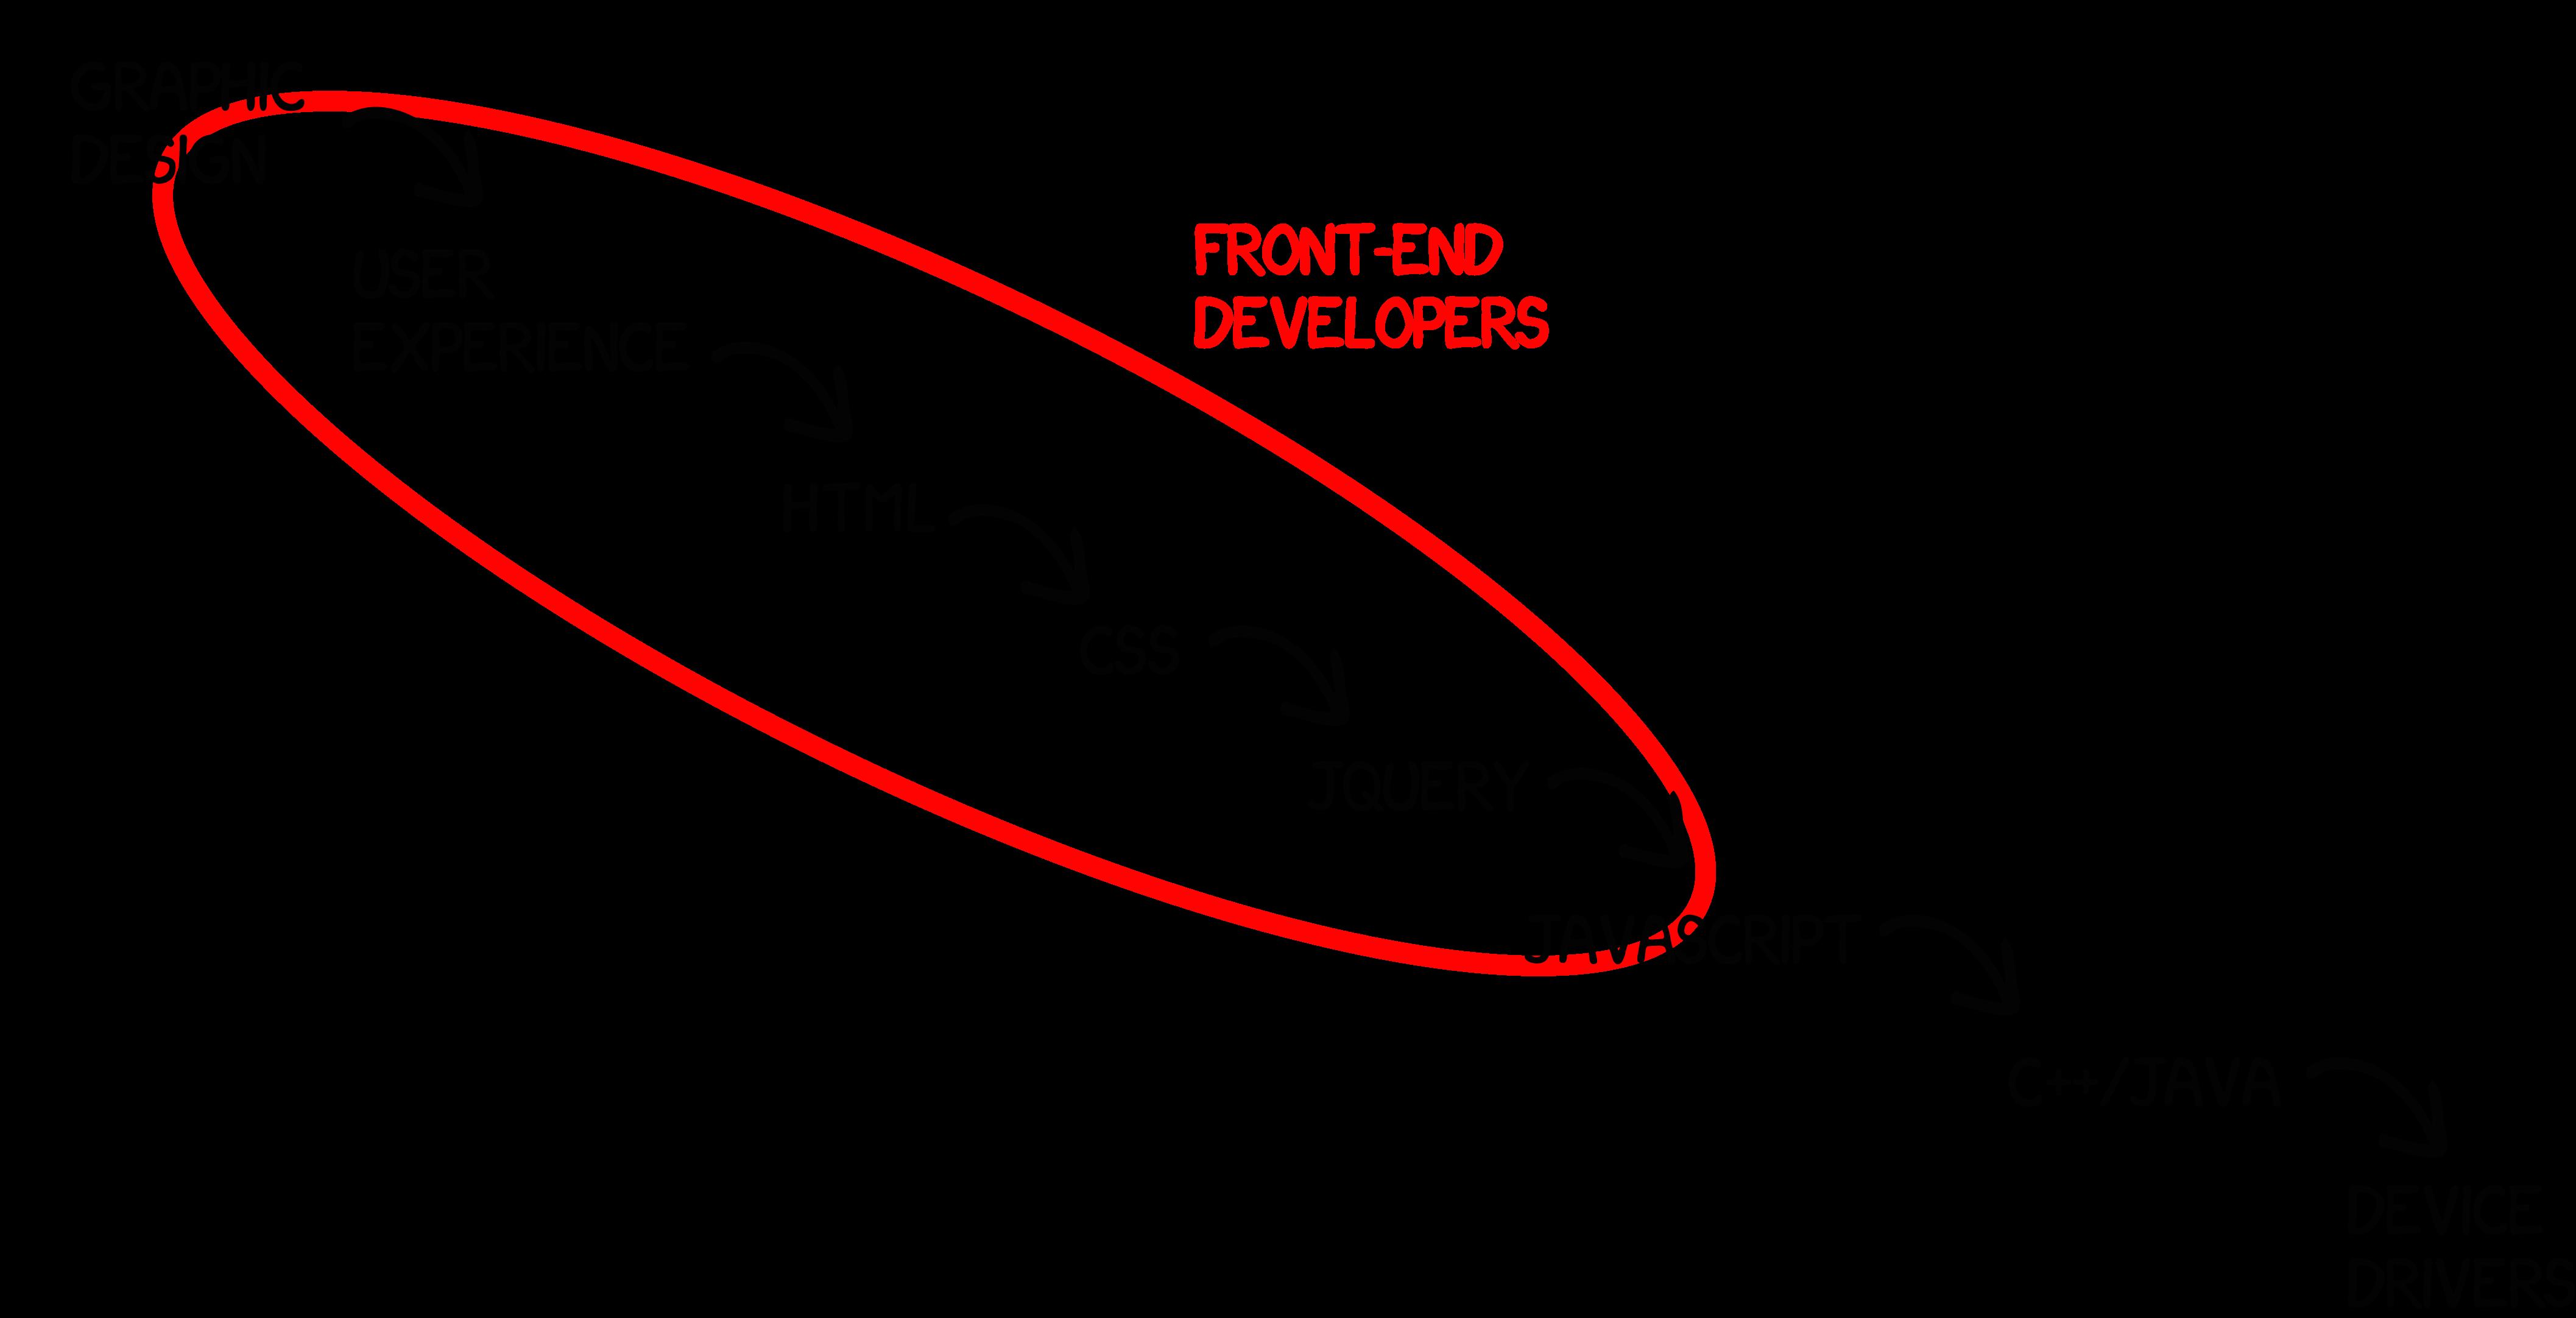 Front End Development Diagram Automotive Wiring Jeep The Shifting Definition Of Developer Rh Blog Salsitasoft Com Ford Suspension